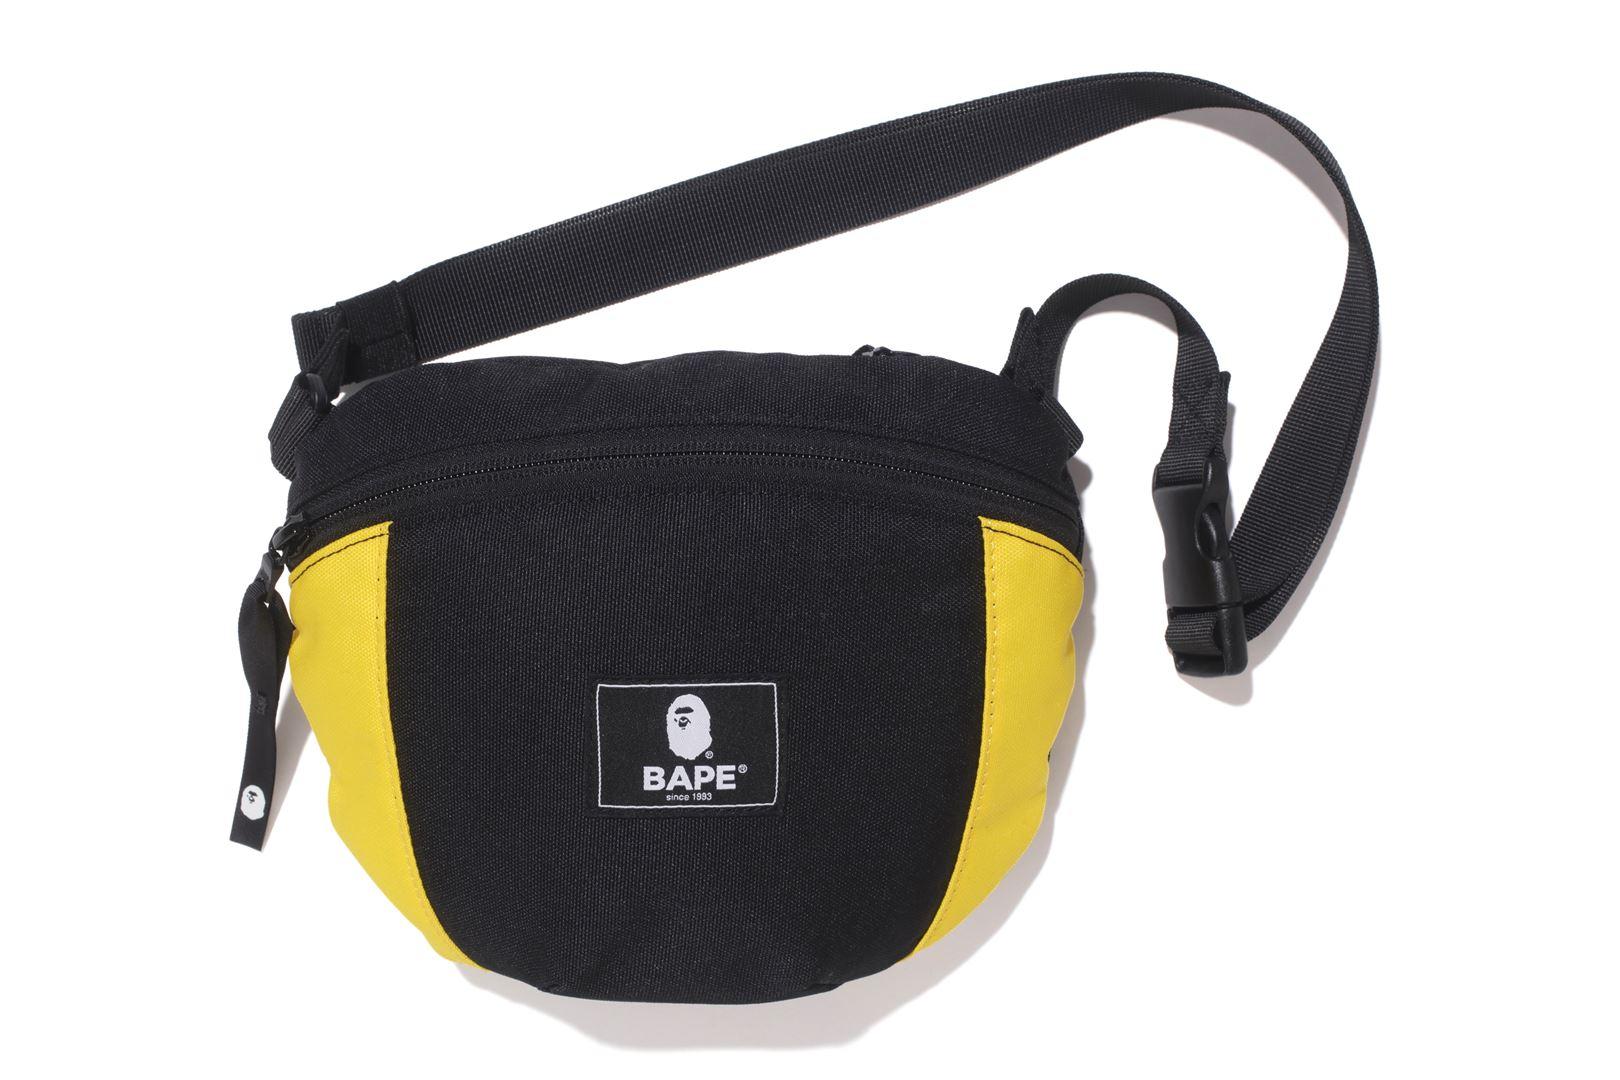 Bape 2tone Shoulder Bag Yellow